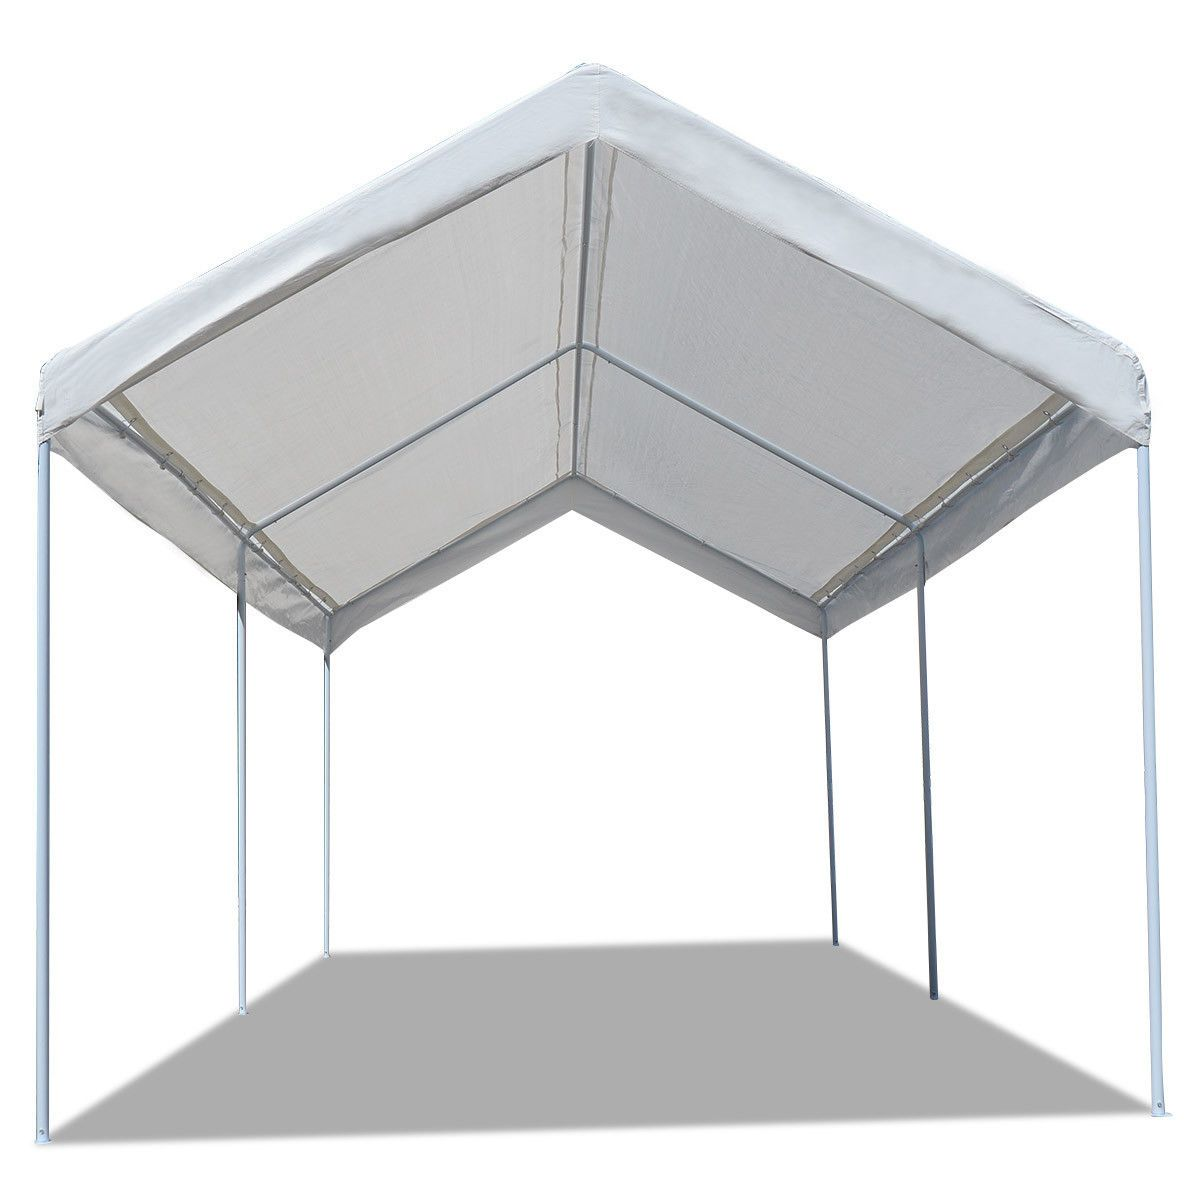 10 x 20 Steel Frame Canopy Shelter Portable Car Carport